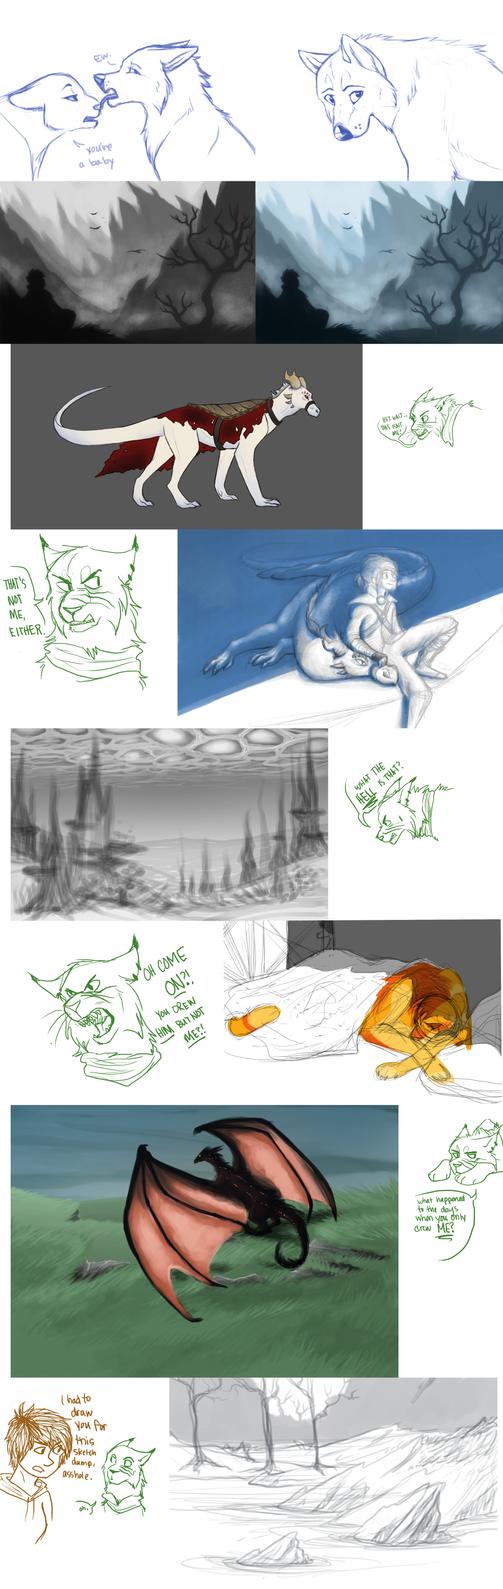 sketchdump 2k14 by Staniqs